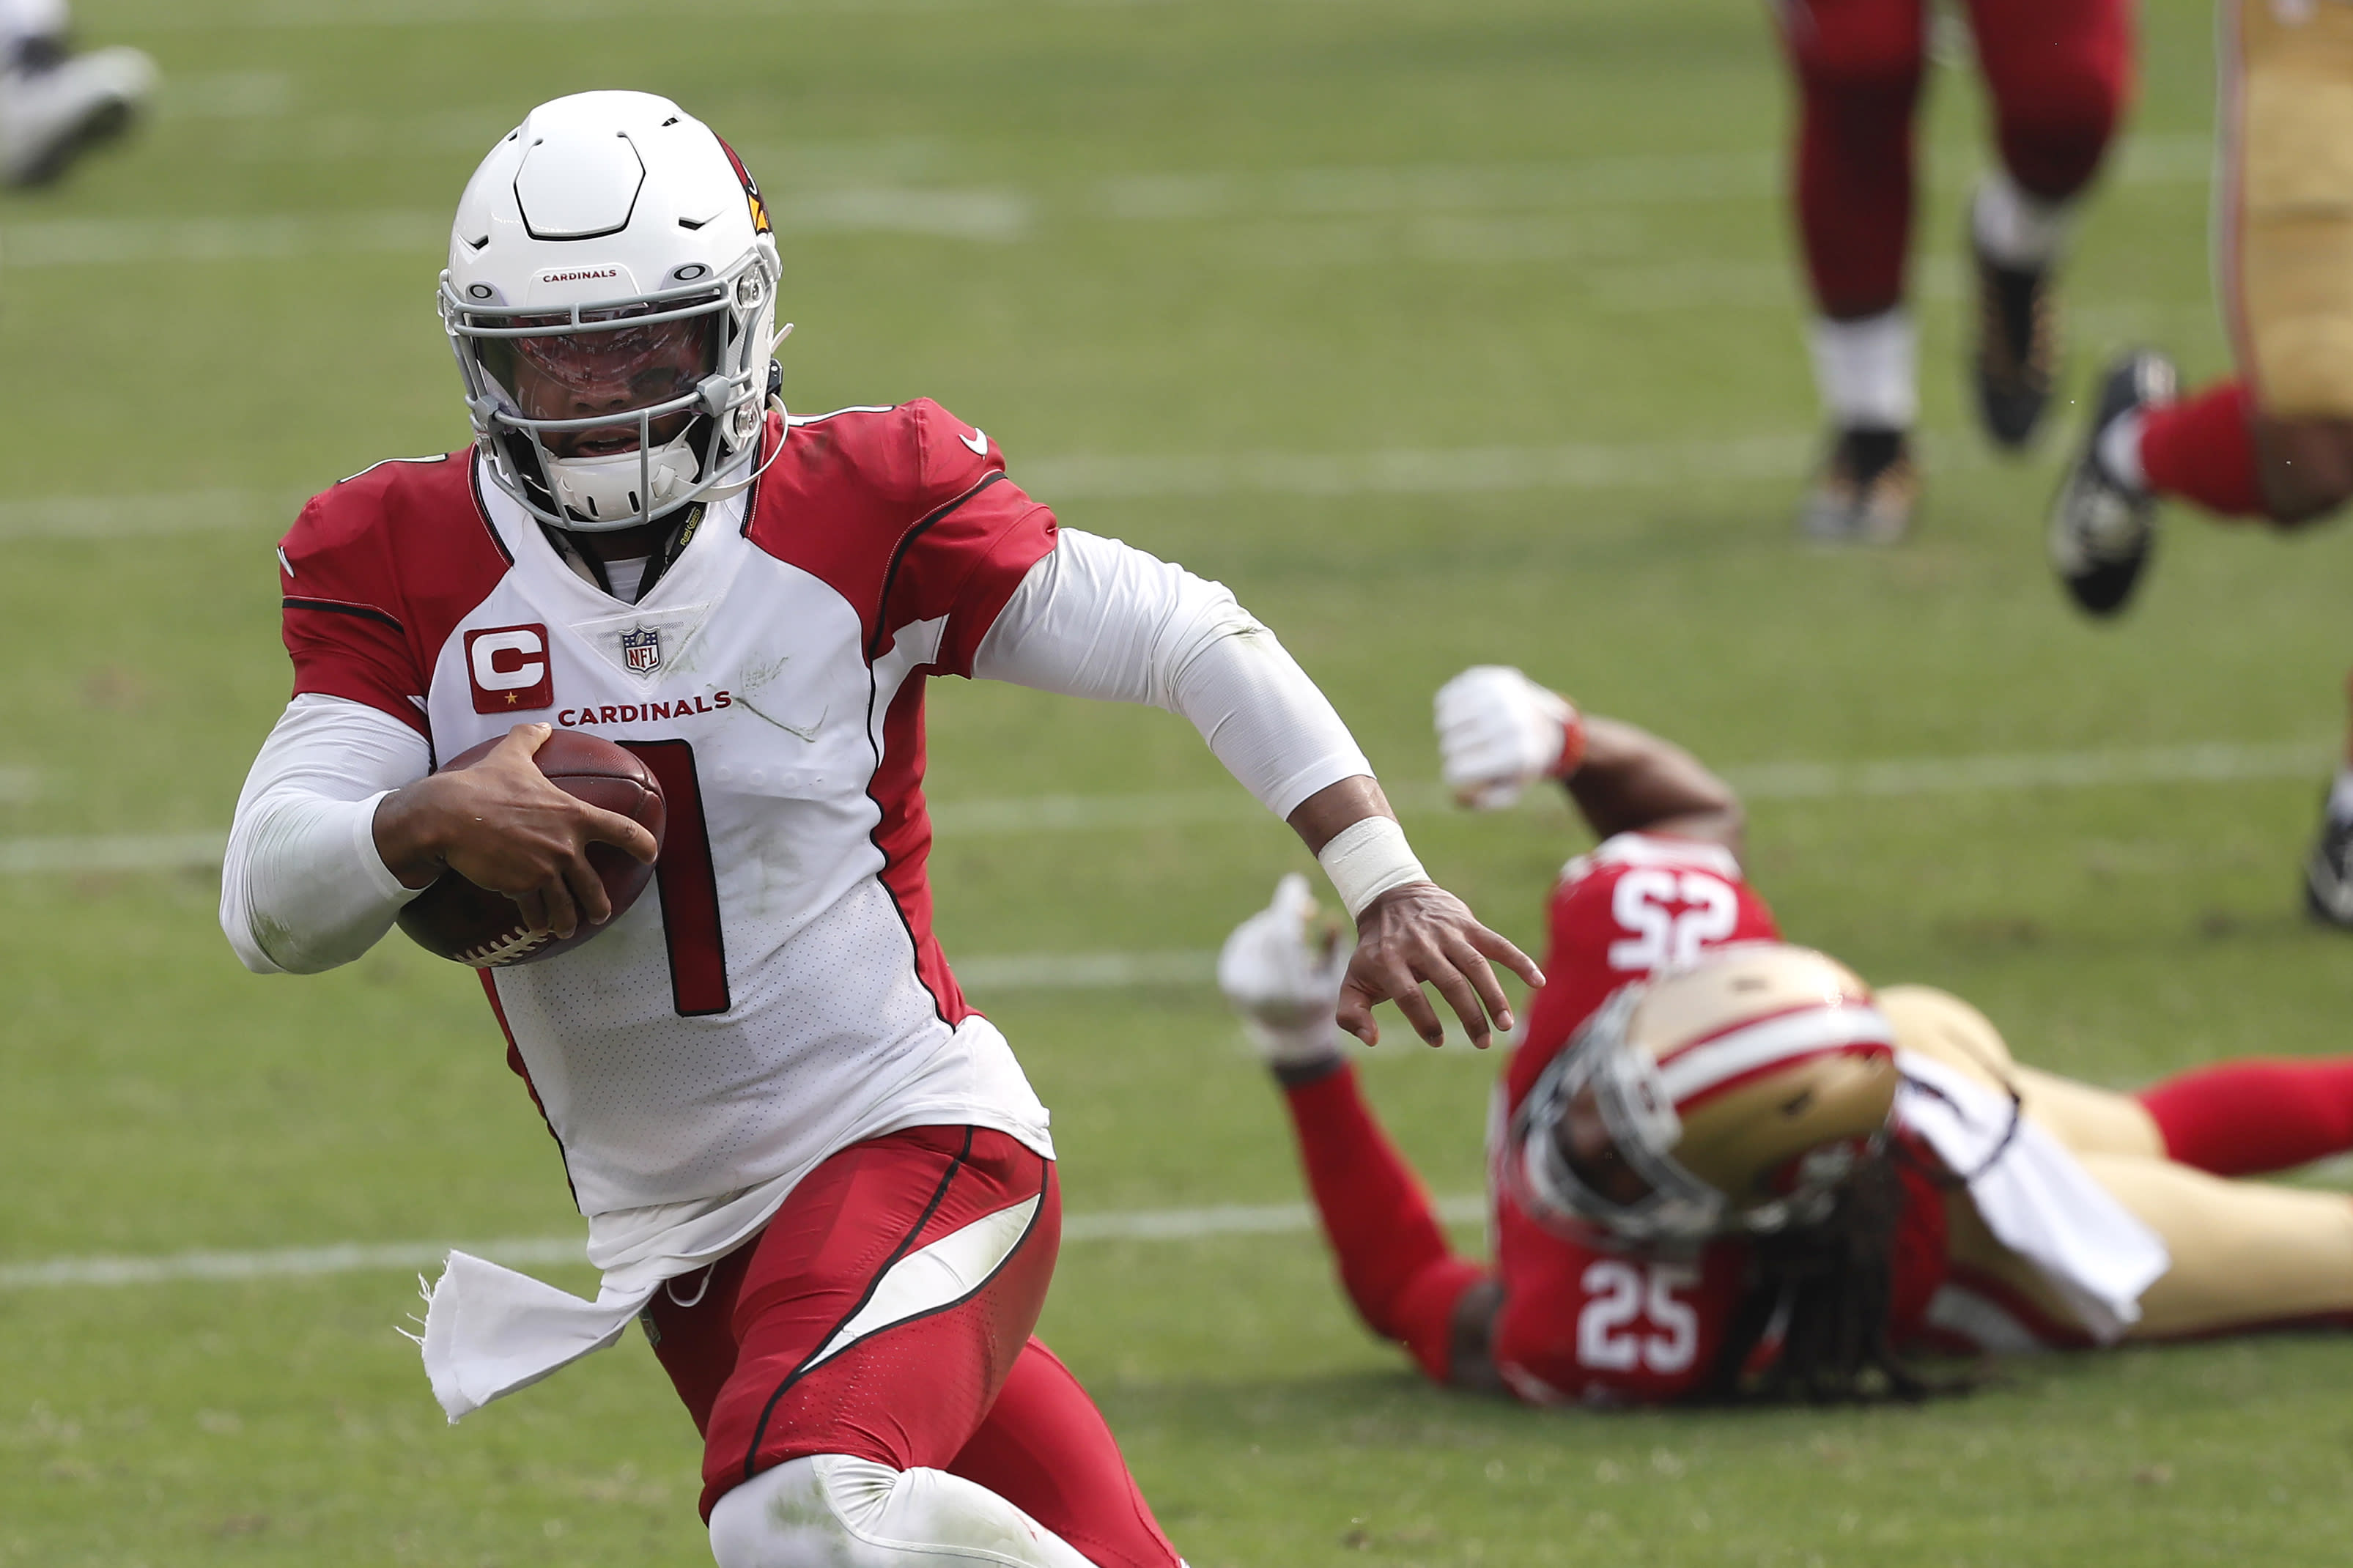 Arizona Cardinals quarterback Kyler Murray (1) runs past San Francisco 49ers cornerback Richard Sherman (25) to score a touchdown during the second half of an NFL football game in Santa Clara, Calif., Sunday, Sept. 13, 2020. (AP Photo/Josie Lepe)